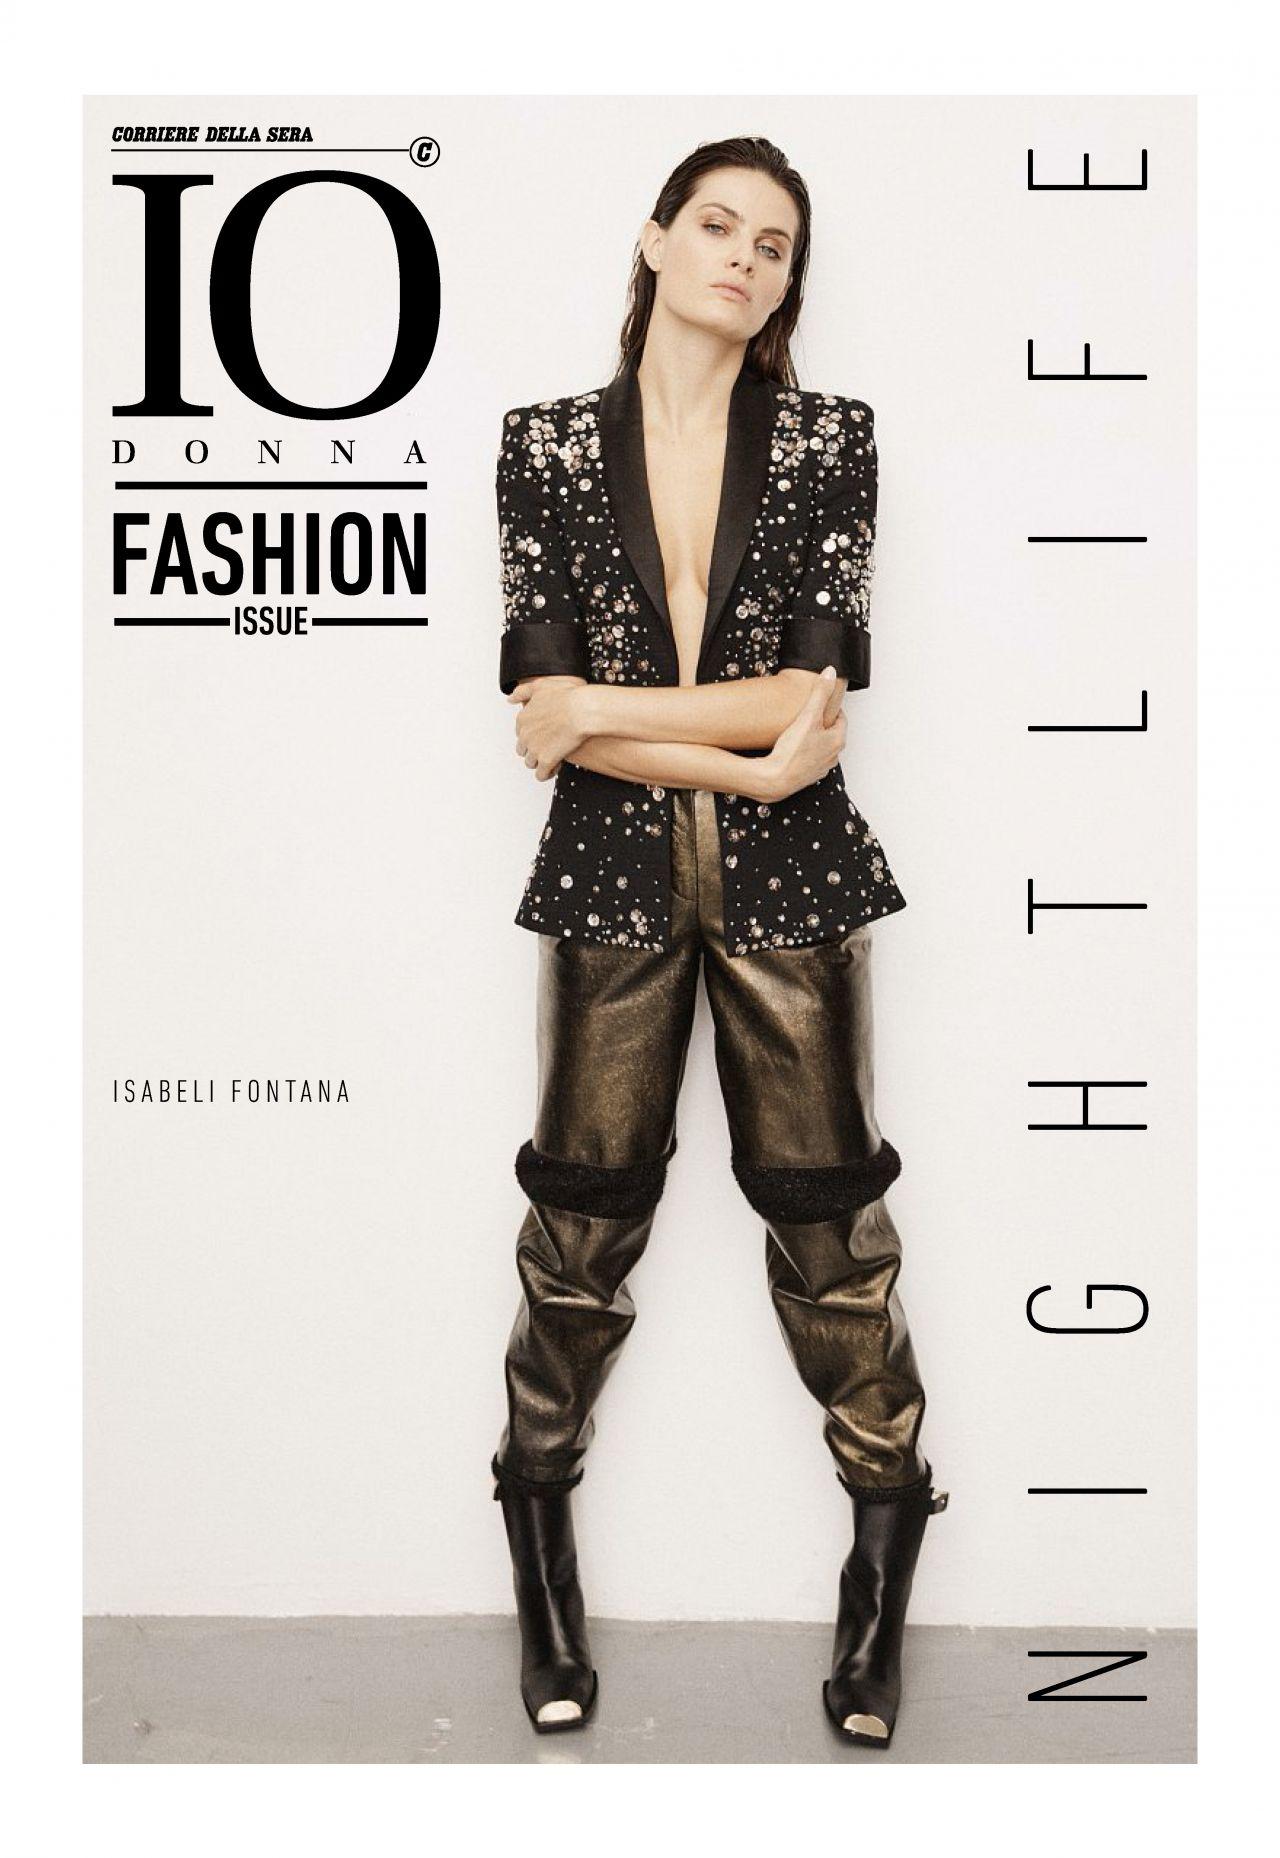 Fashion October 2016: Io Donna Fashion Issue, October 27th 2017